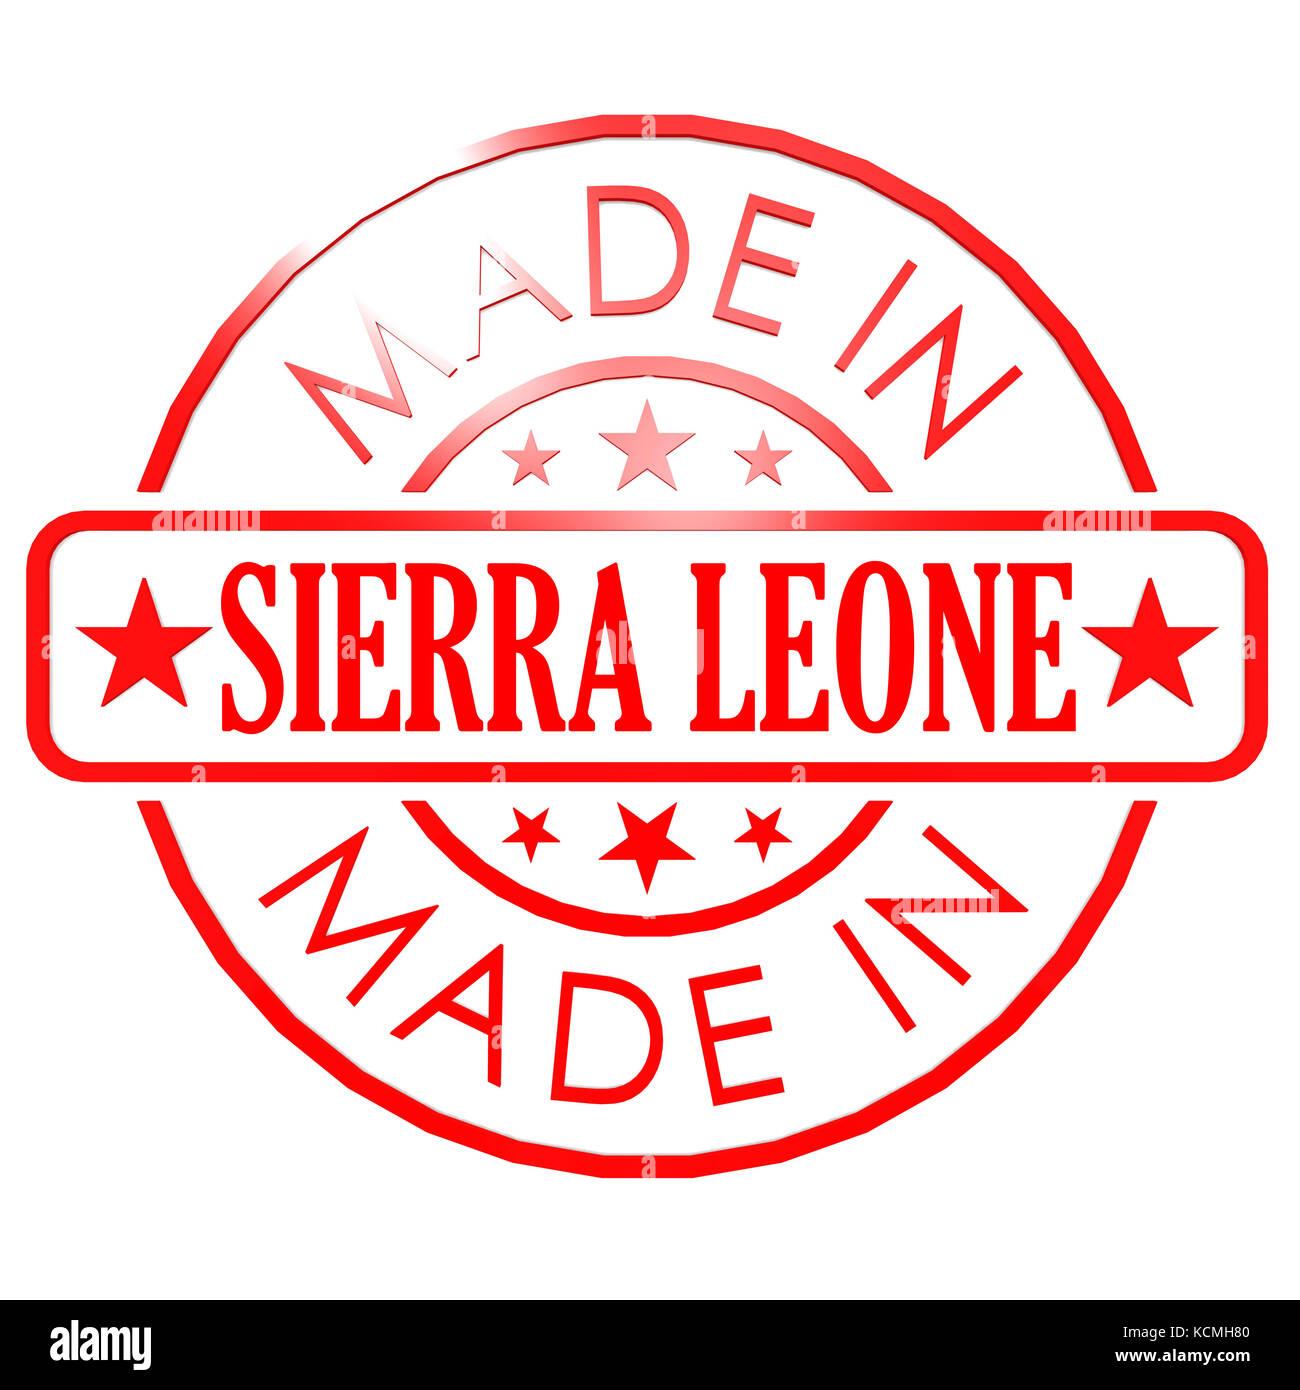 Sierra leone market stock photos sierra leone market stock made in sierra leone red seal image with hi res rendered artwork that could be biocorpaavc